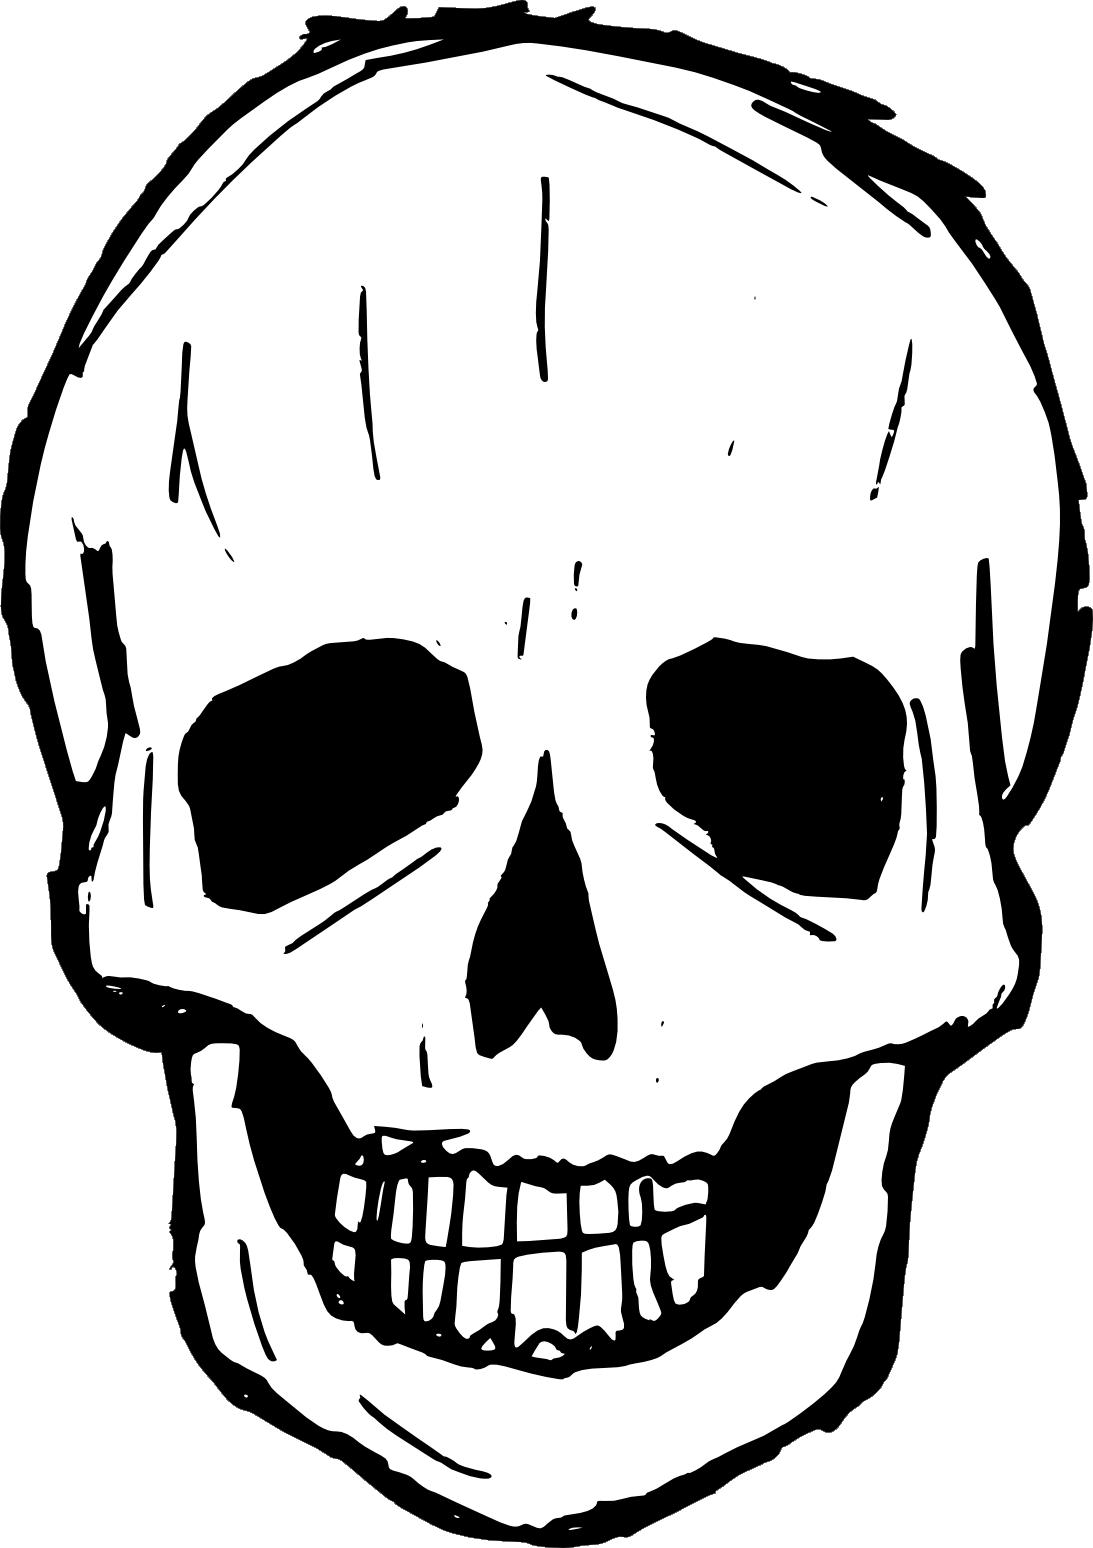 drawing svg transparent. Skull vector png